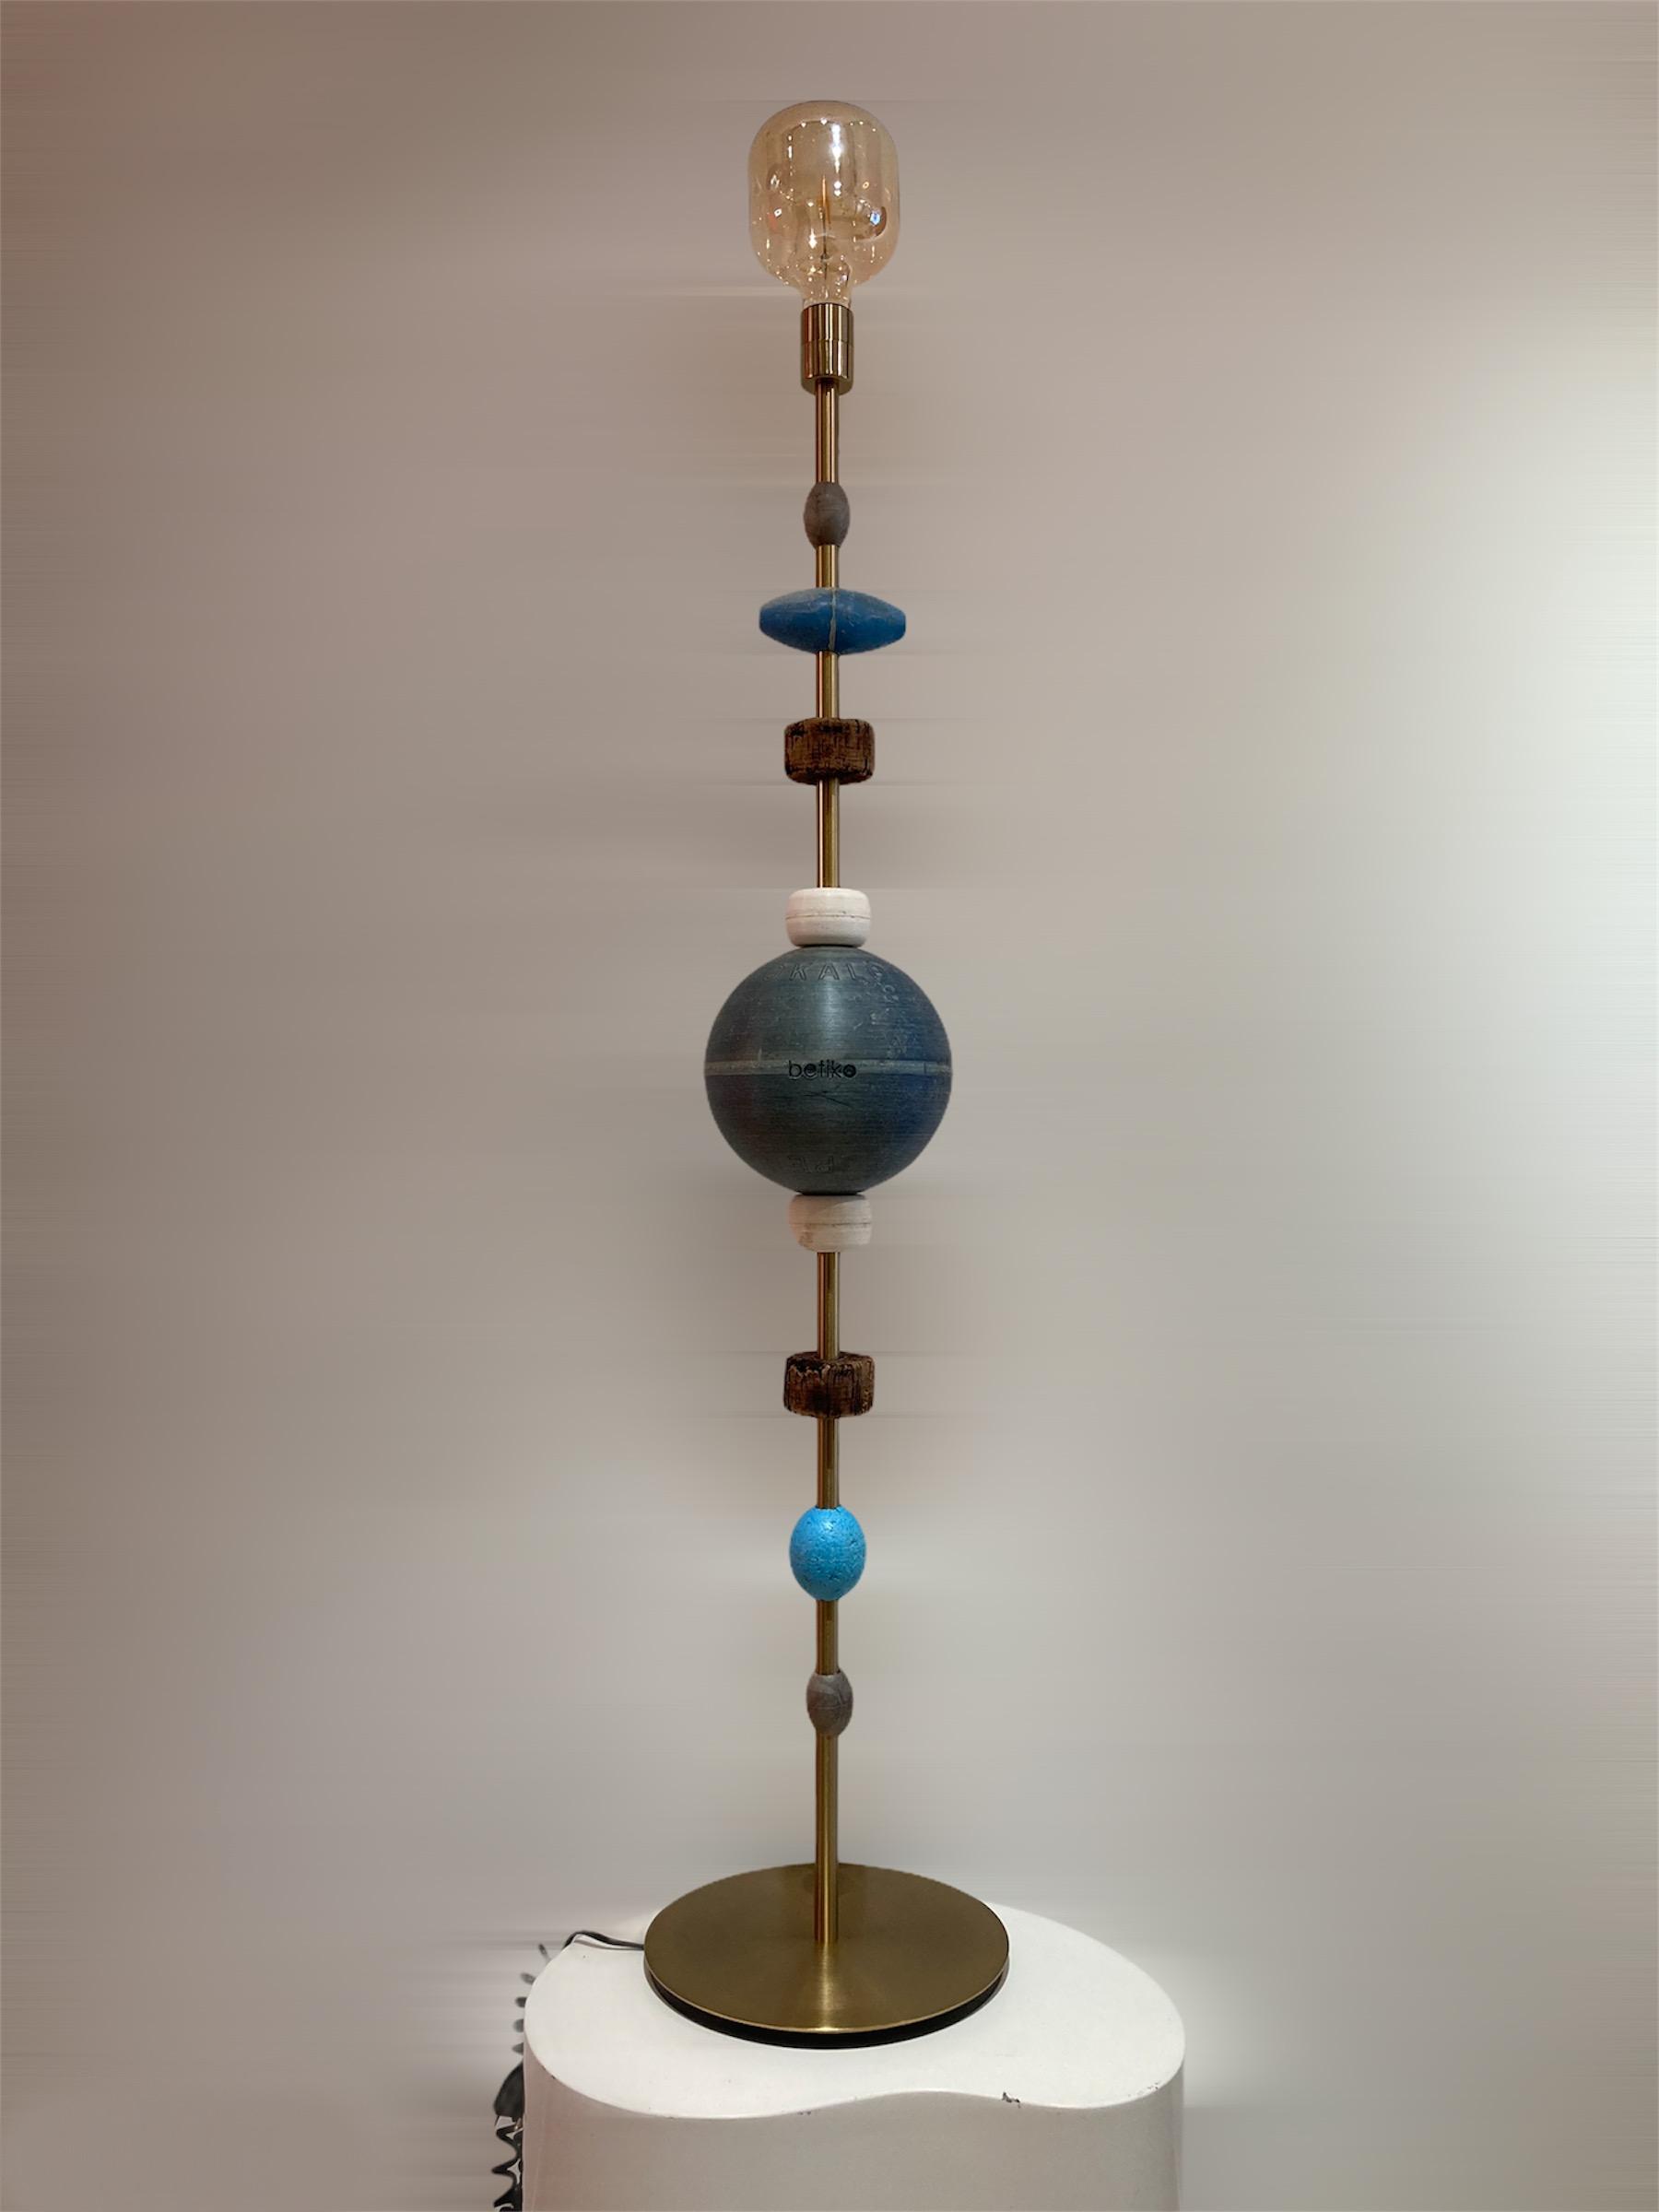 lampadaire lampe a poser betiko nouveauté bleu océan recyclage upcycling